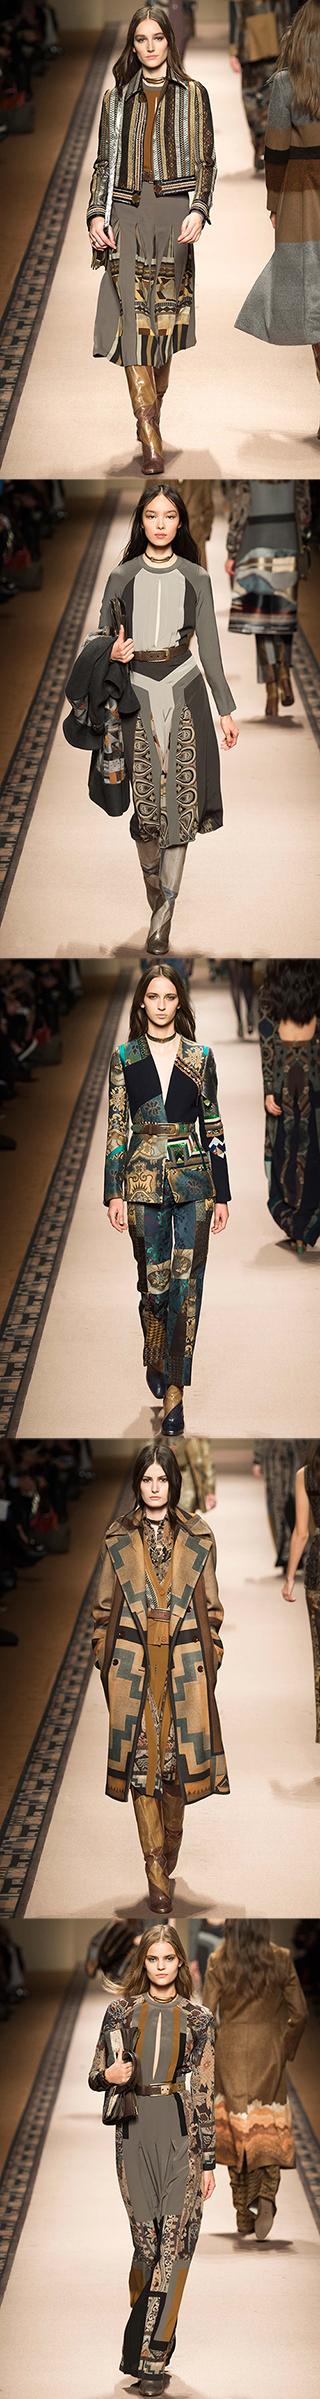 Etro - Fall/Winter 2015 Favorite Looks - Watch the Fashion Show here: http://www.thetravelstylepoet.com/etro-fallwinter-2015-runway/